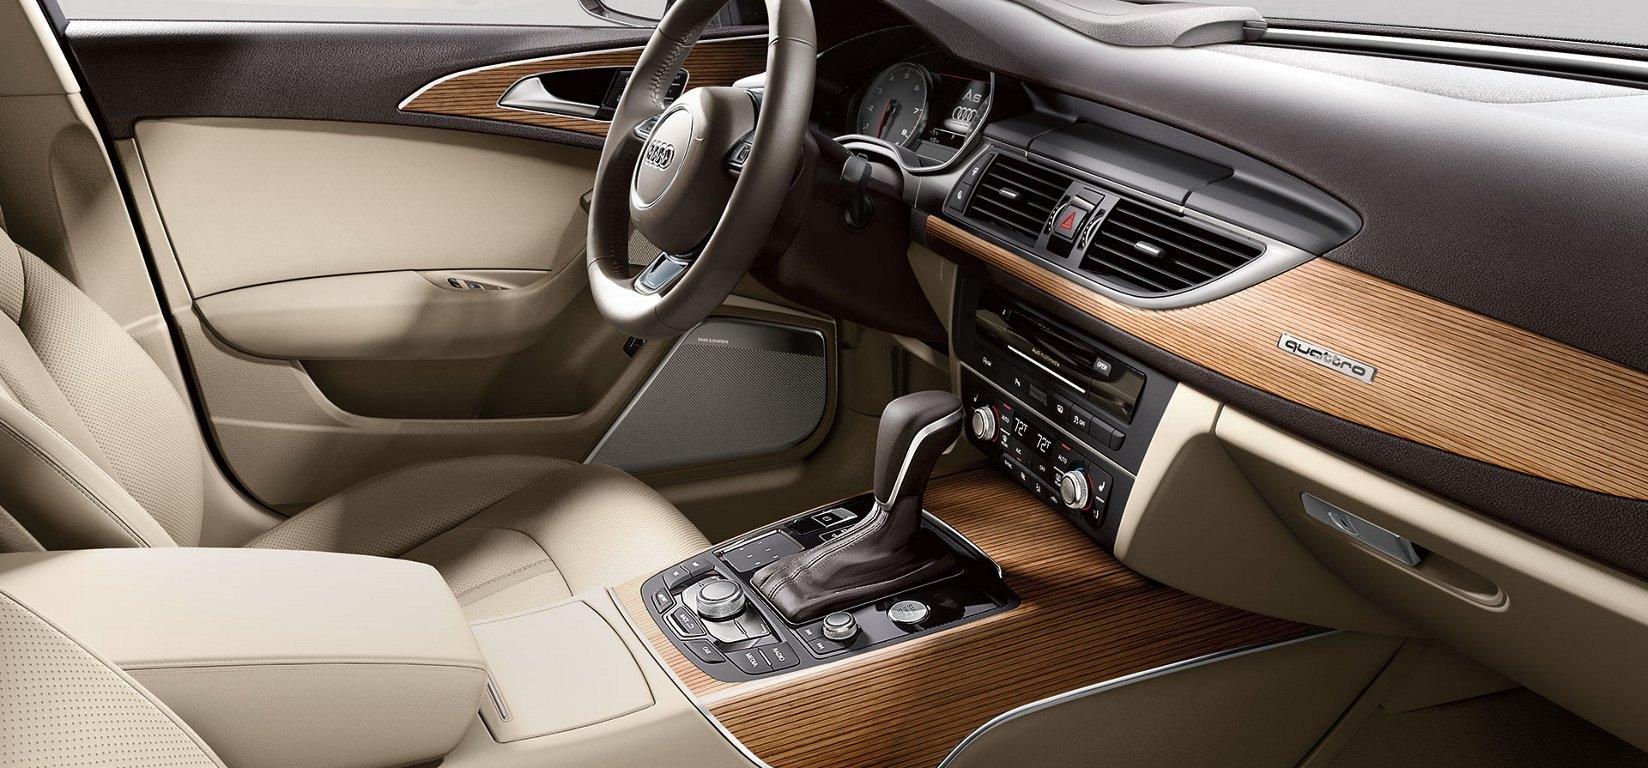 New Audi A6 Interior main image